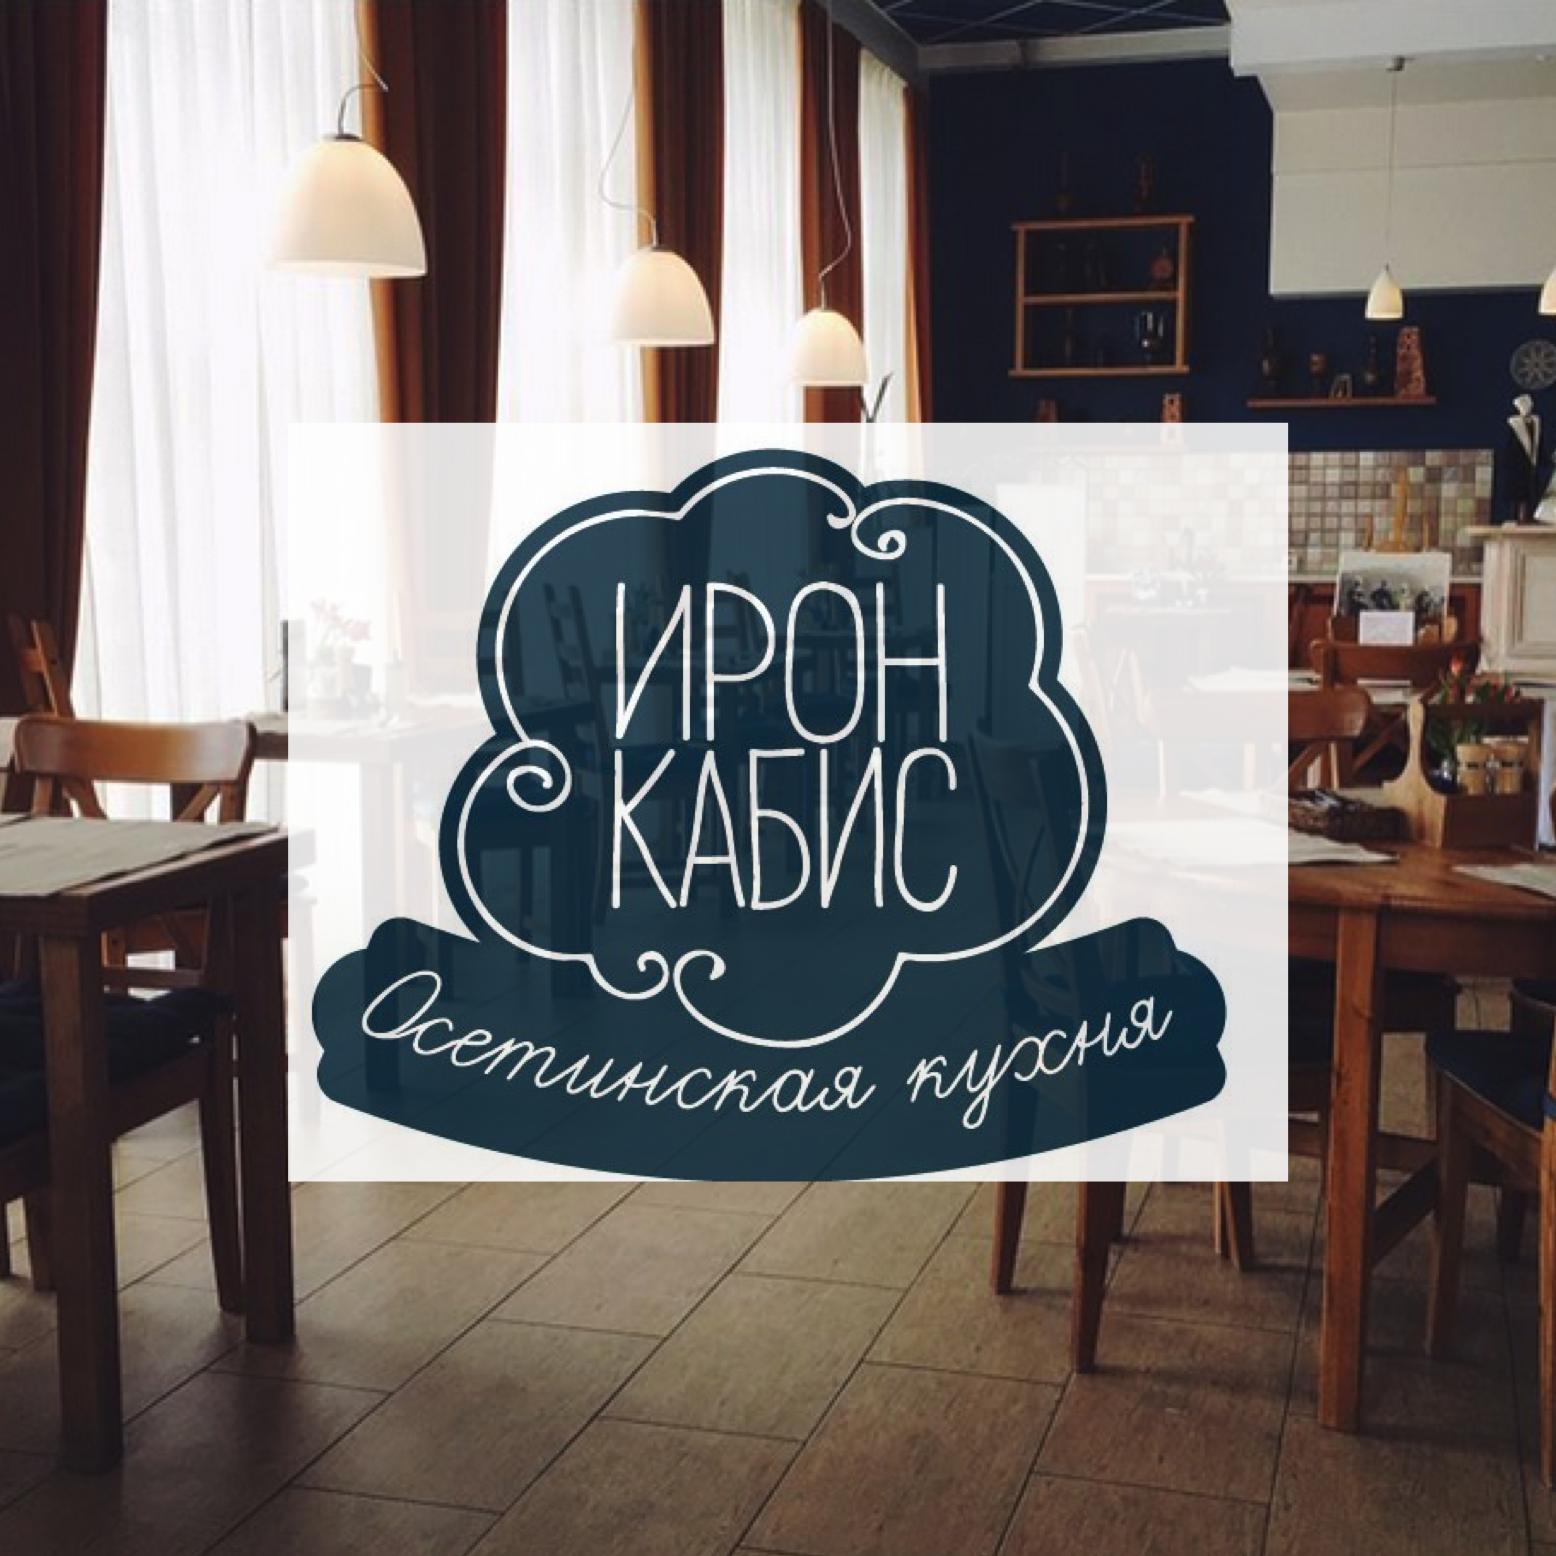 "Дружелюбное кафе ""Ирон Кабис"""